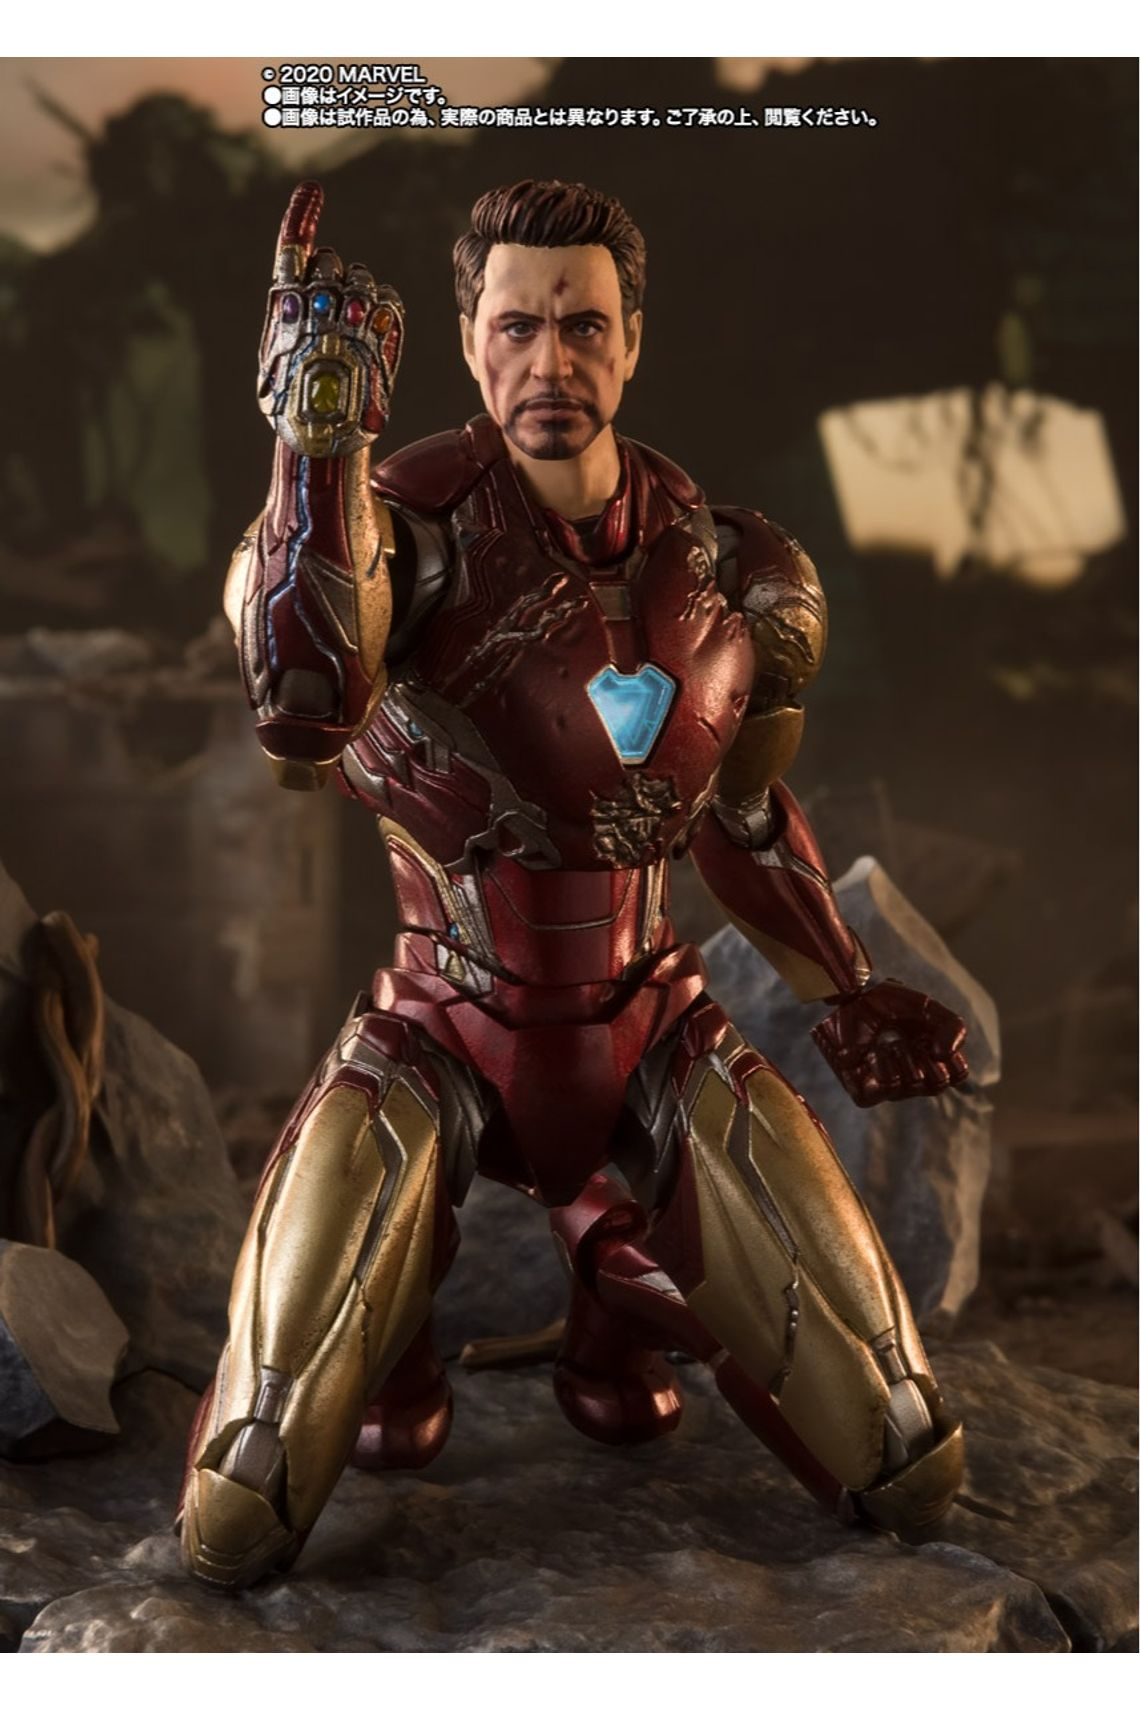 Action Figure Homem de Ferro Iron Man Mark 85 ''I Am Iron Man'': Vingadores Ultimato Avengers Endgame - Bandai